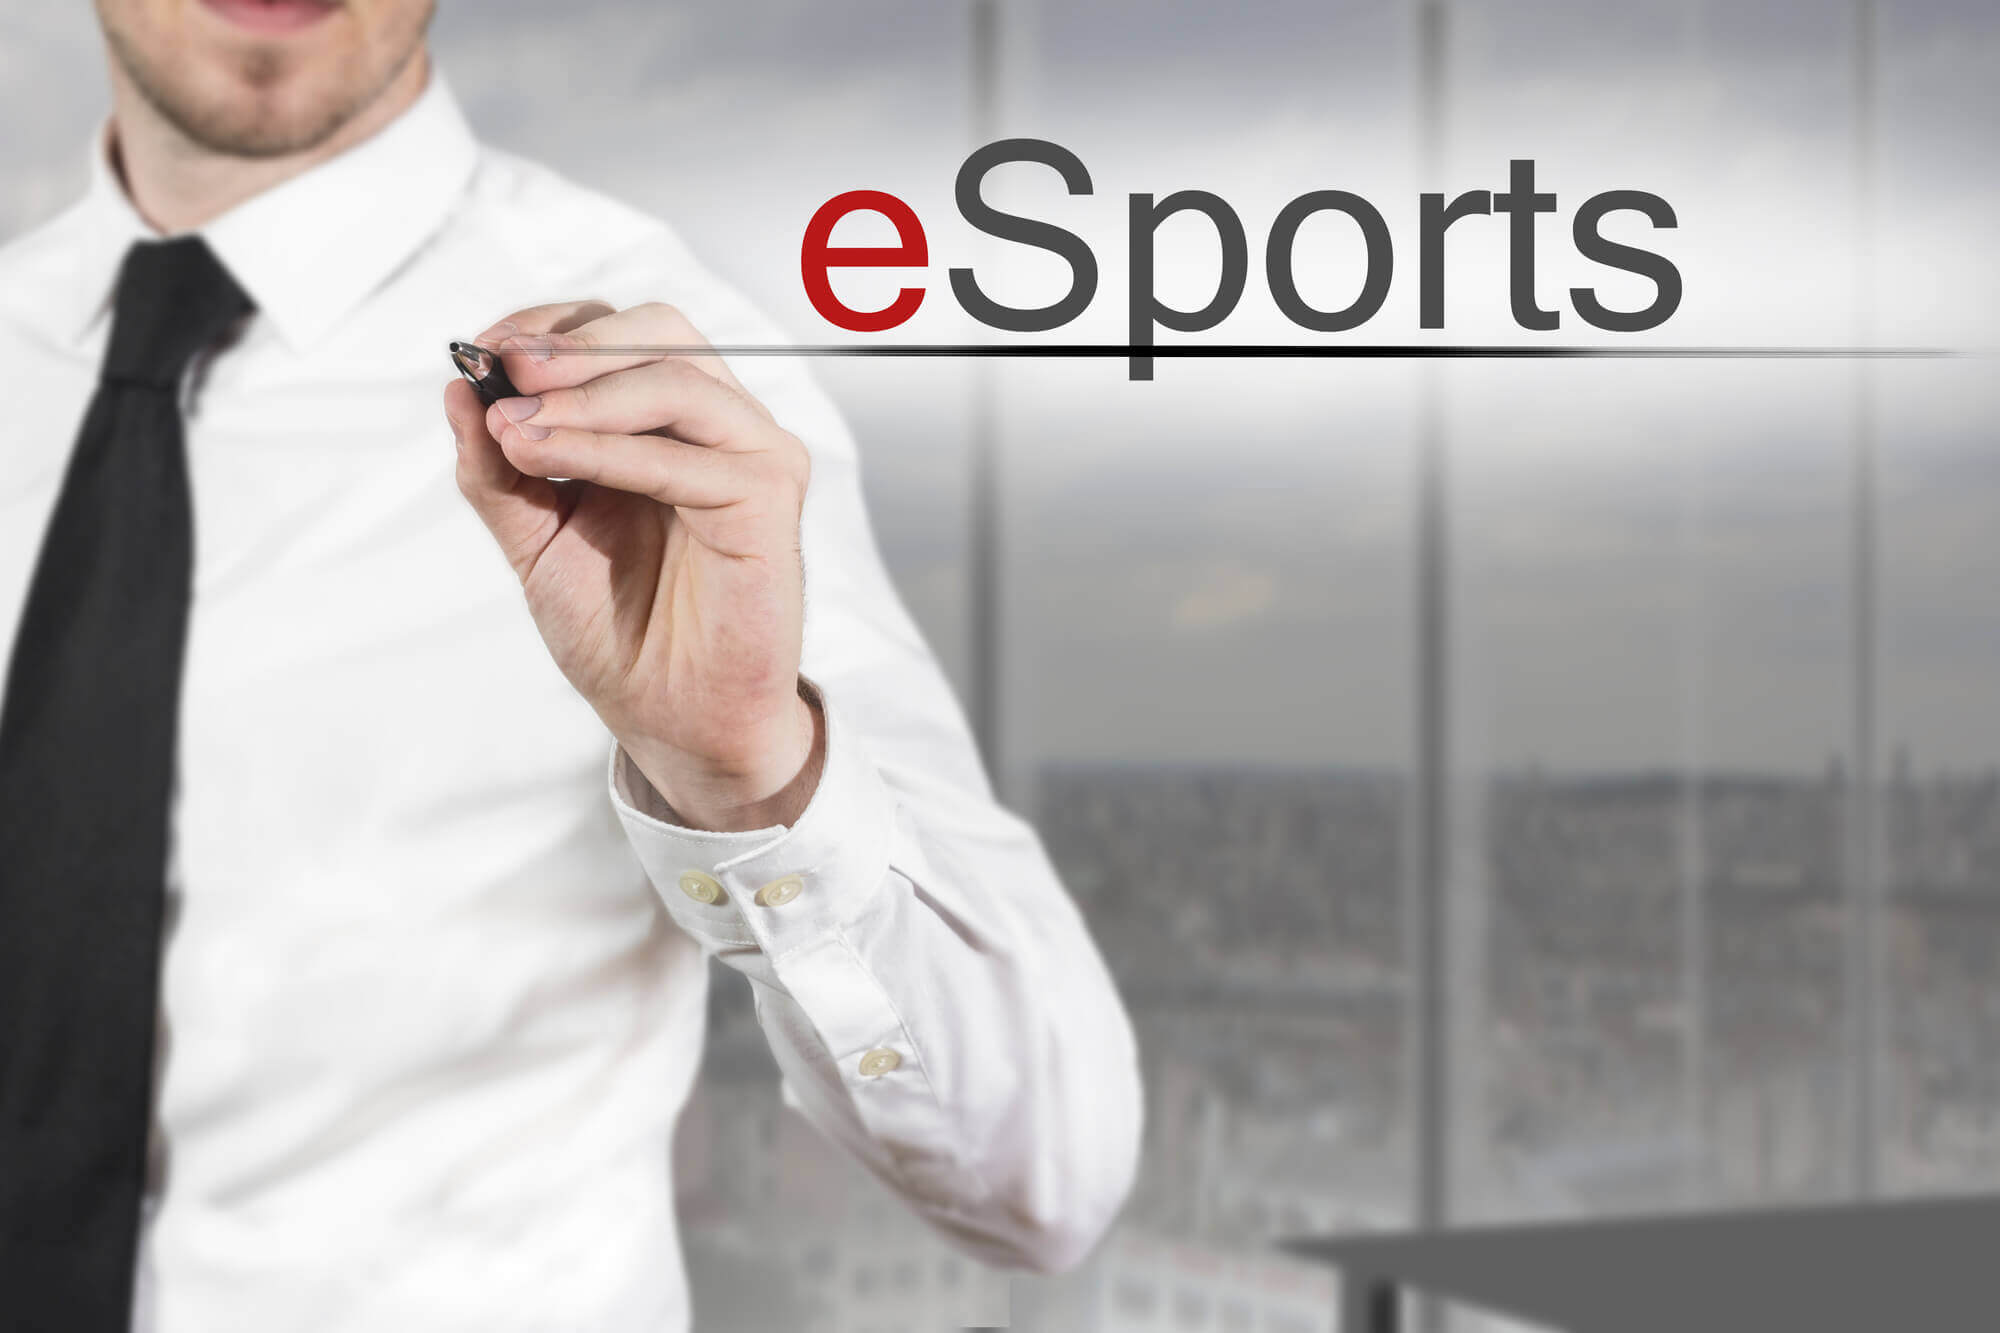 scommesse esports italia